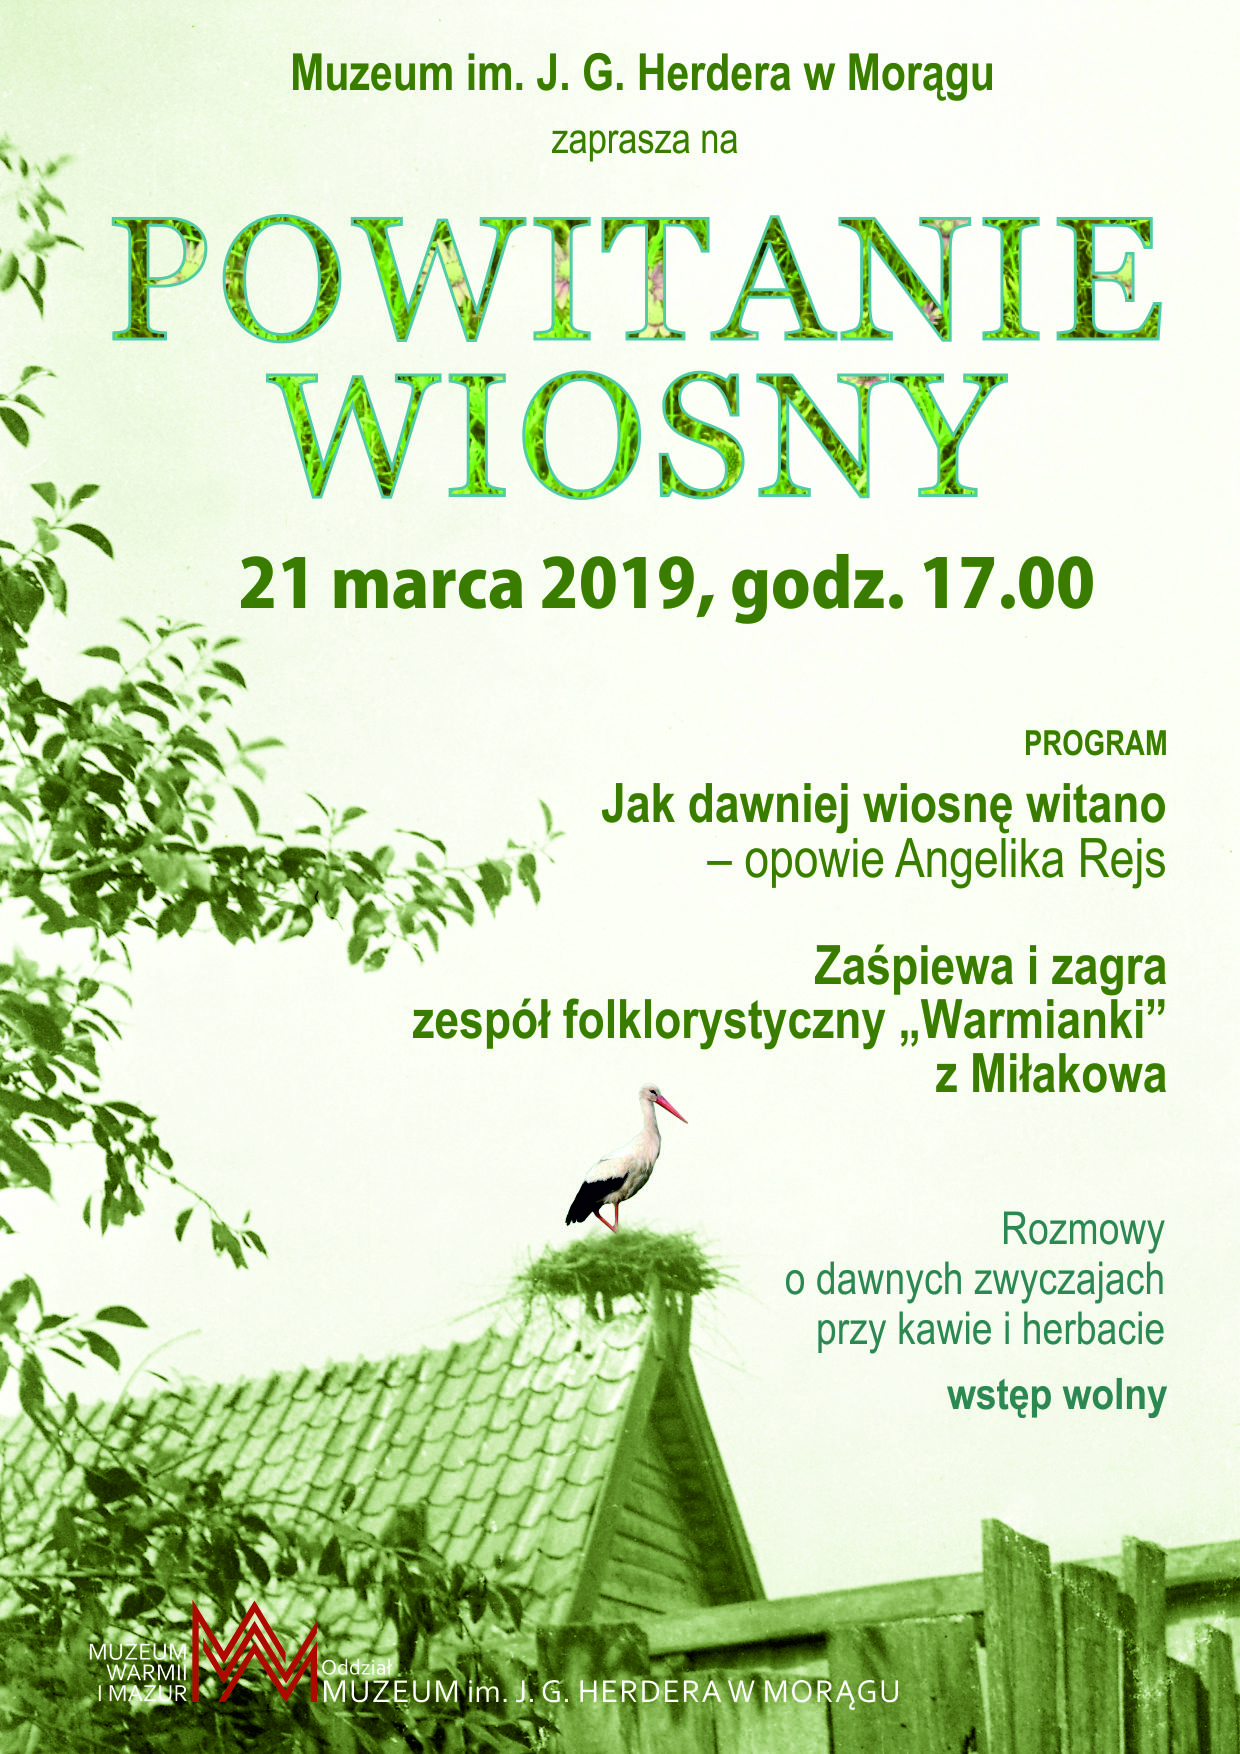 http://m.wmwm.pl/2019/03/orig/wiosna-w-moragu-2019-6344.jpg